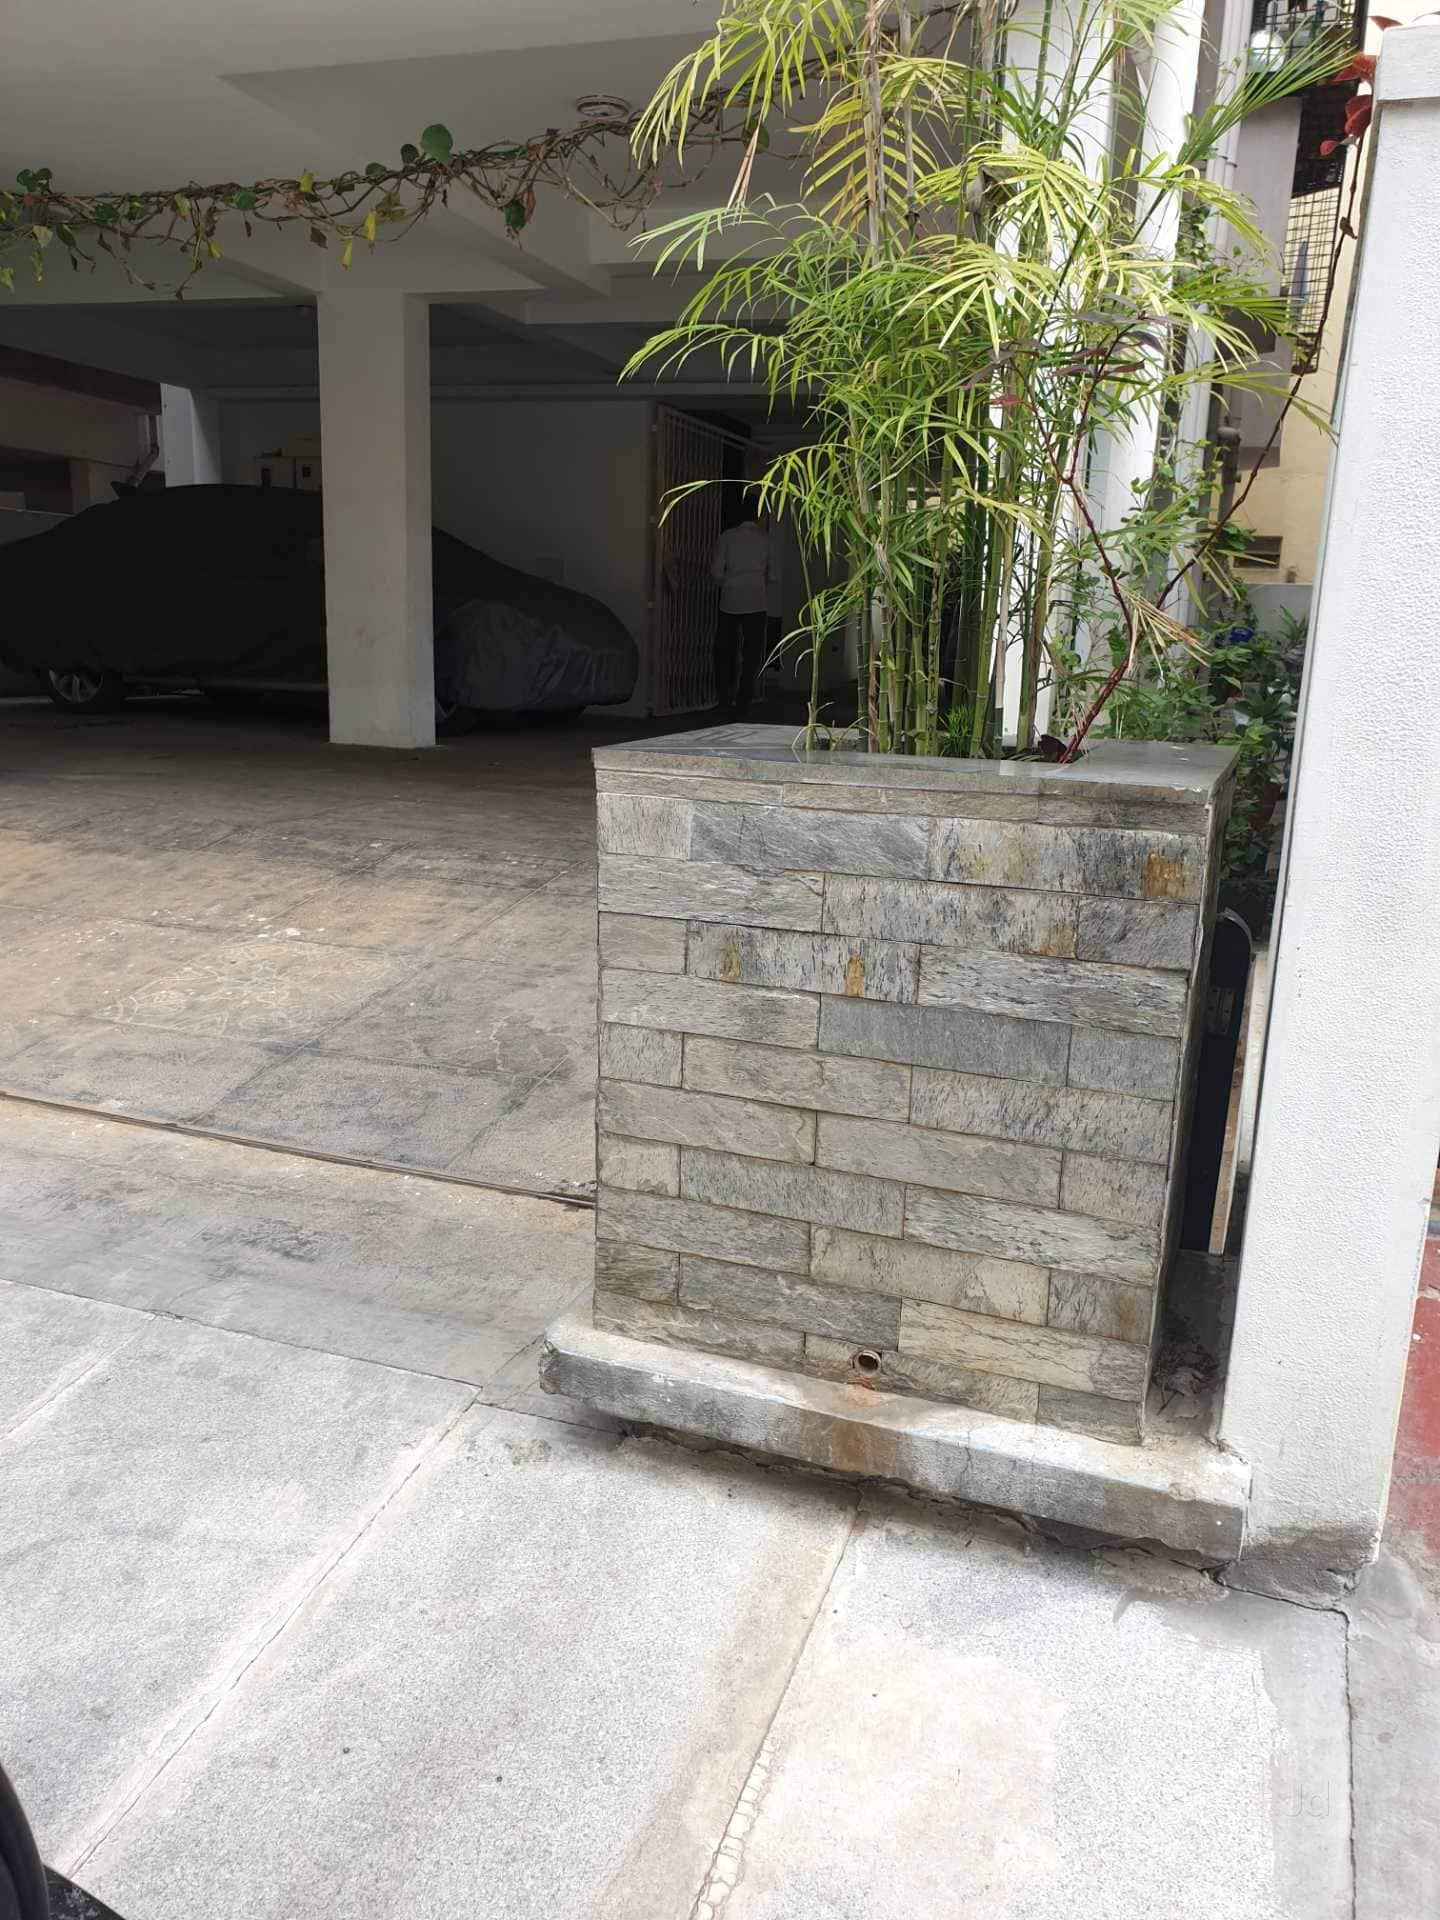 Top 100 Civil Contractors in Rt Nagar, Bangalore - Best